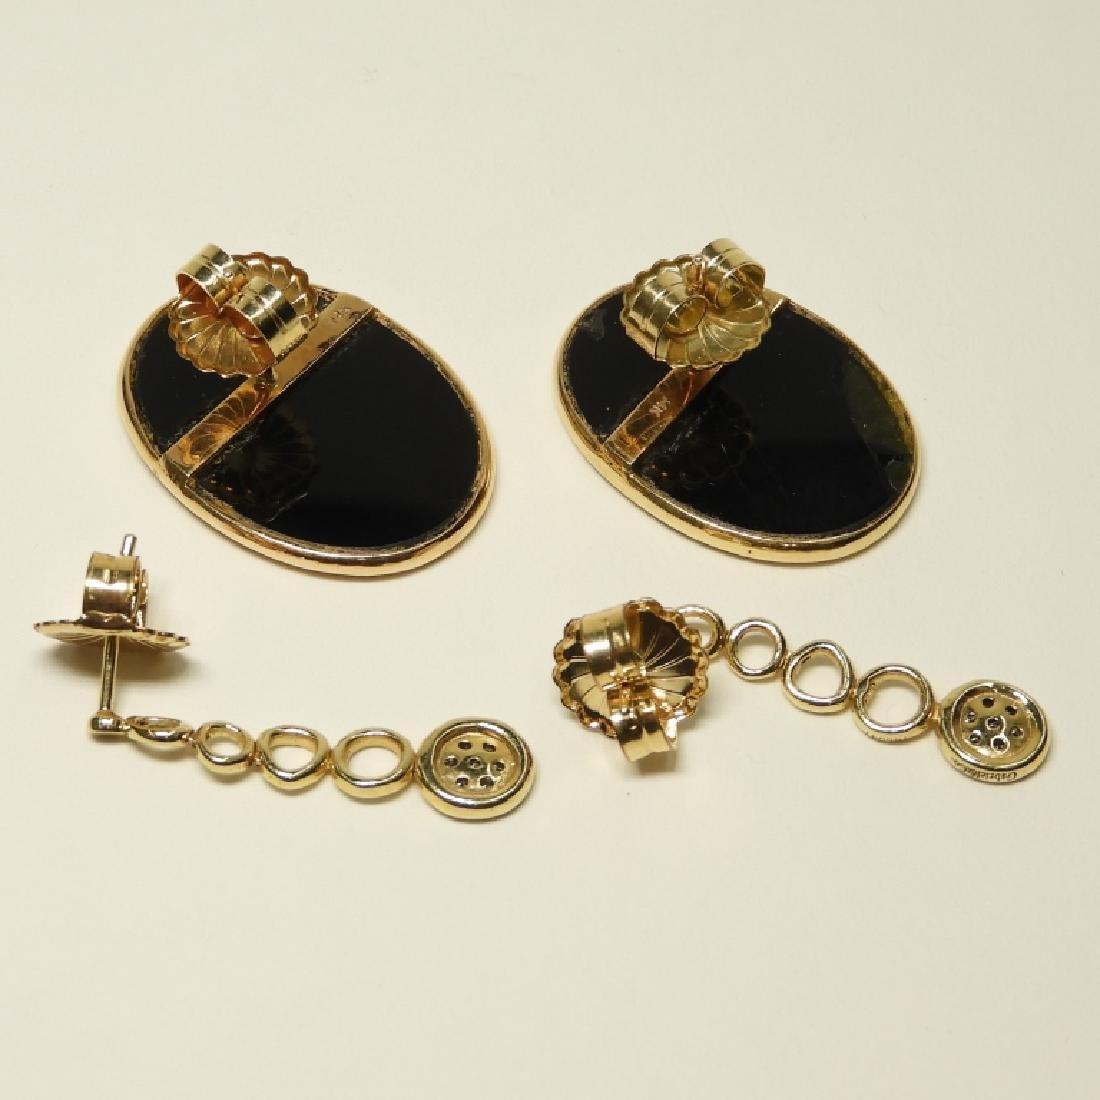 2 Pair 14K Gold Earrings Diamonds Lapis Onyx - 4